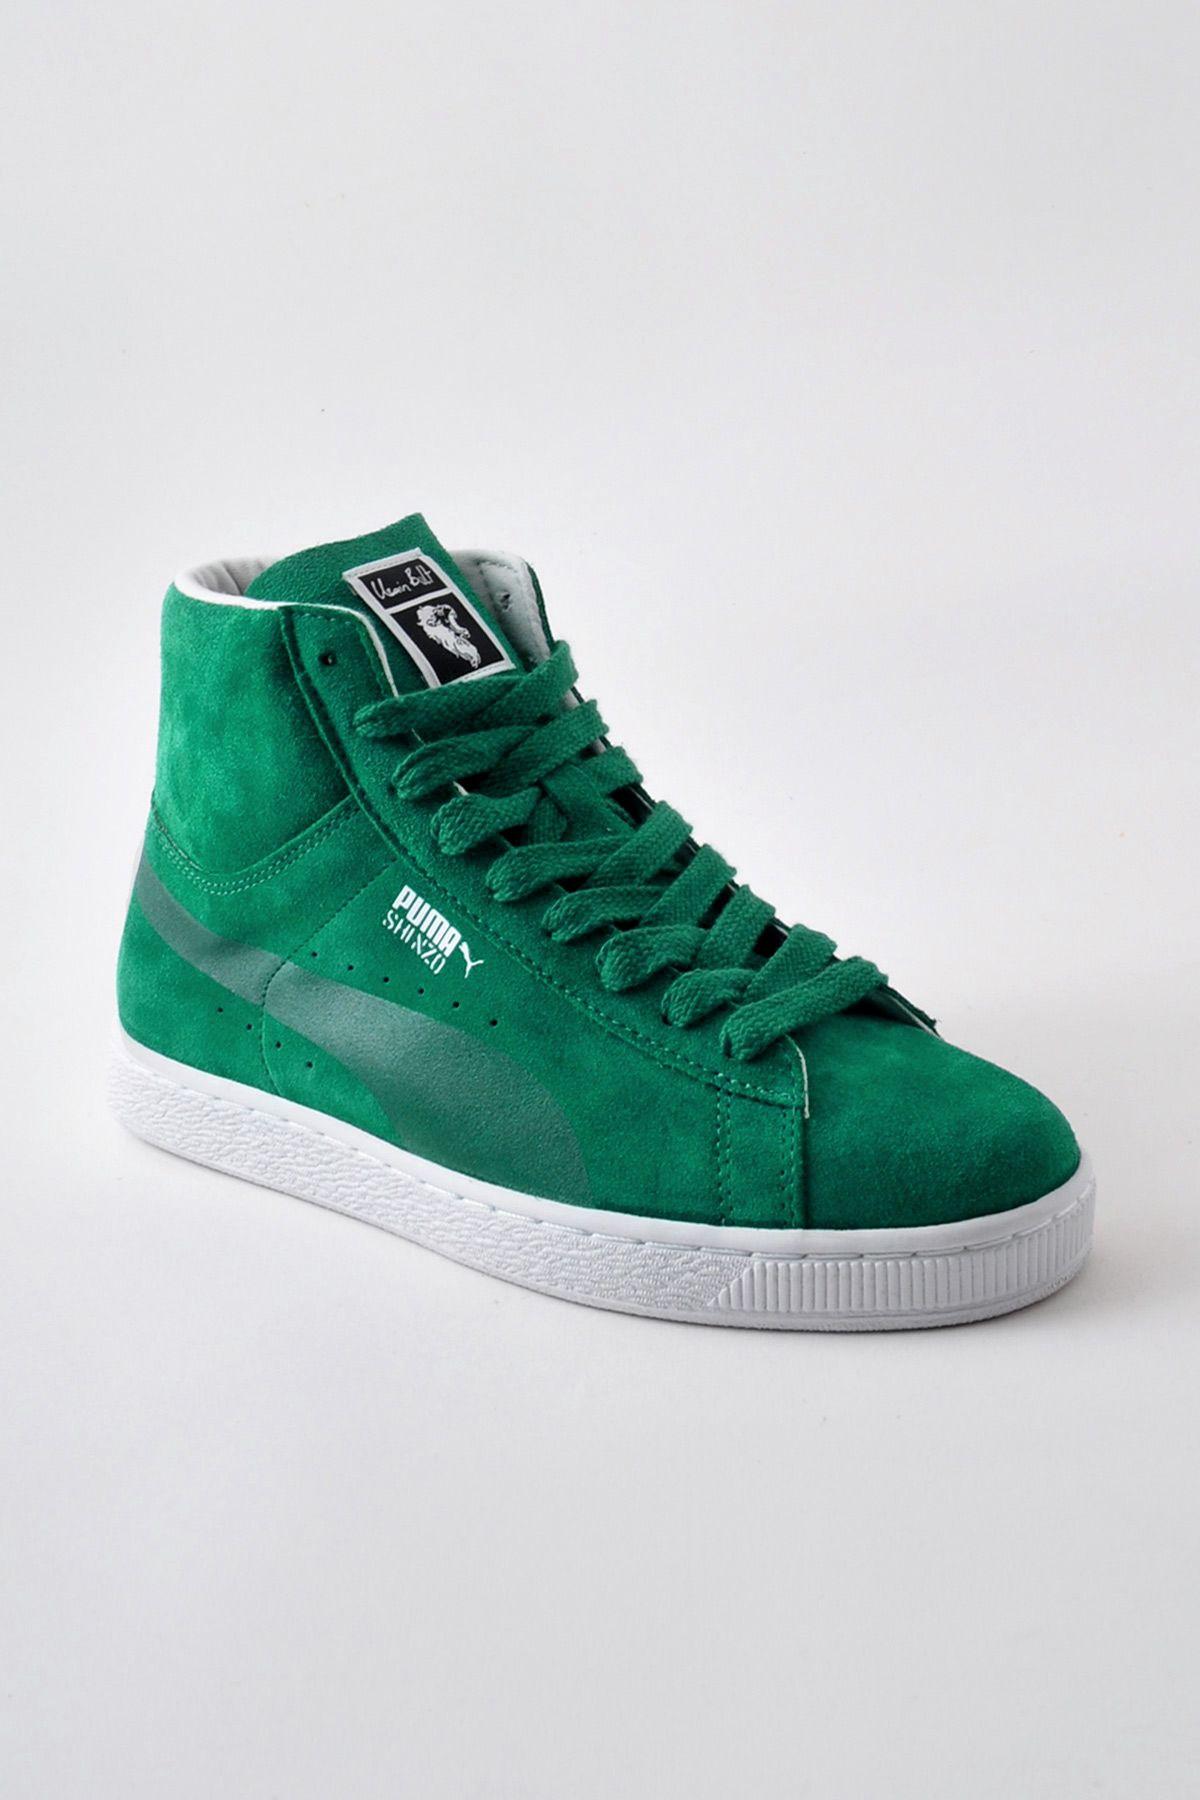 puma high tops green